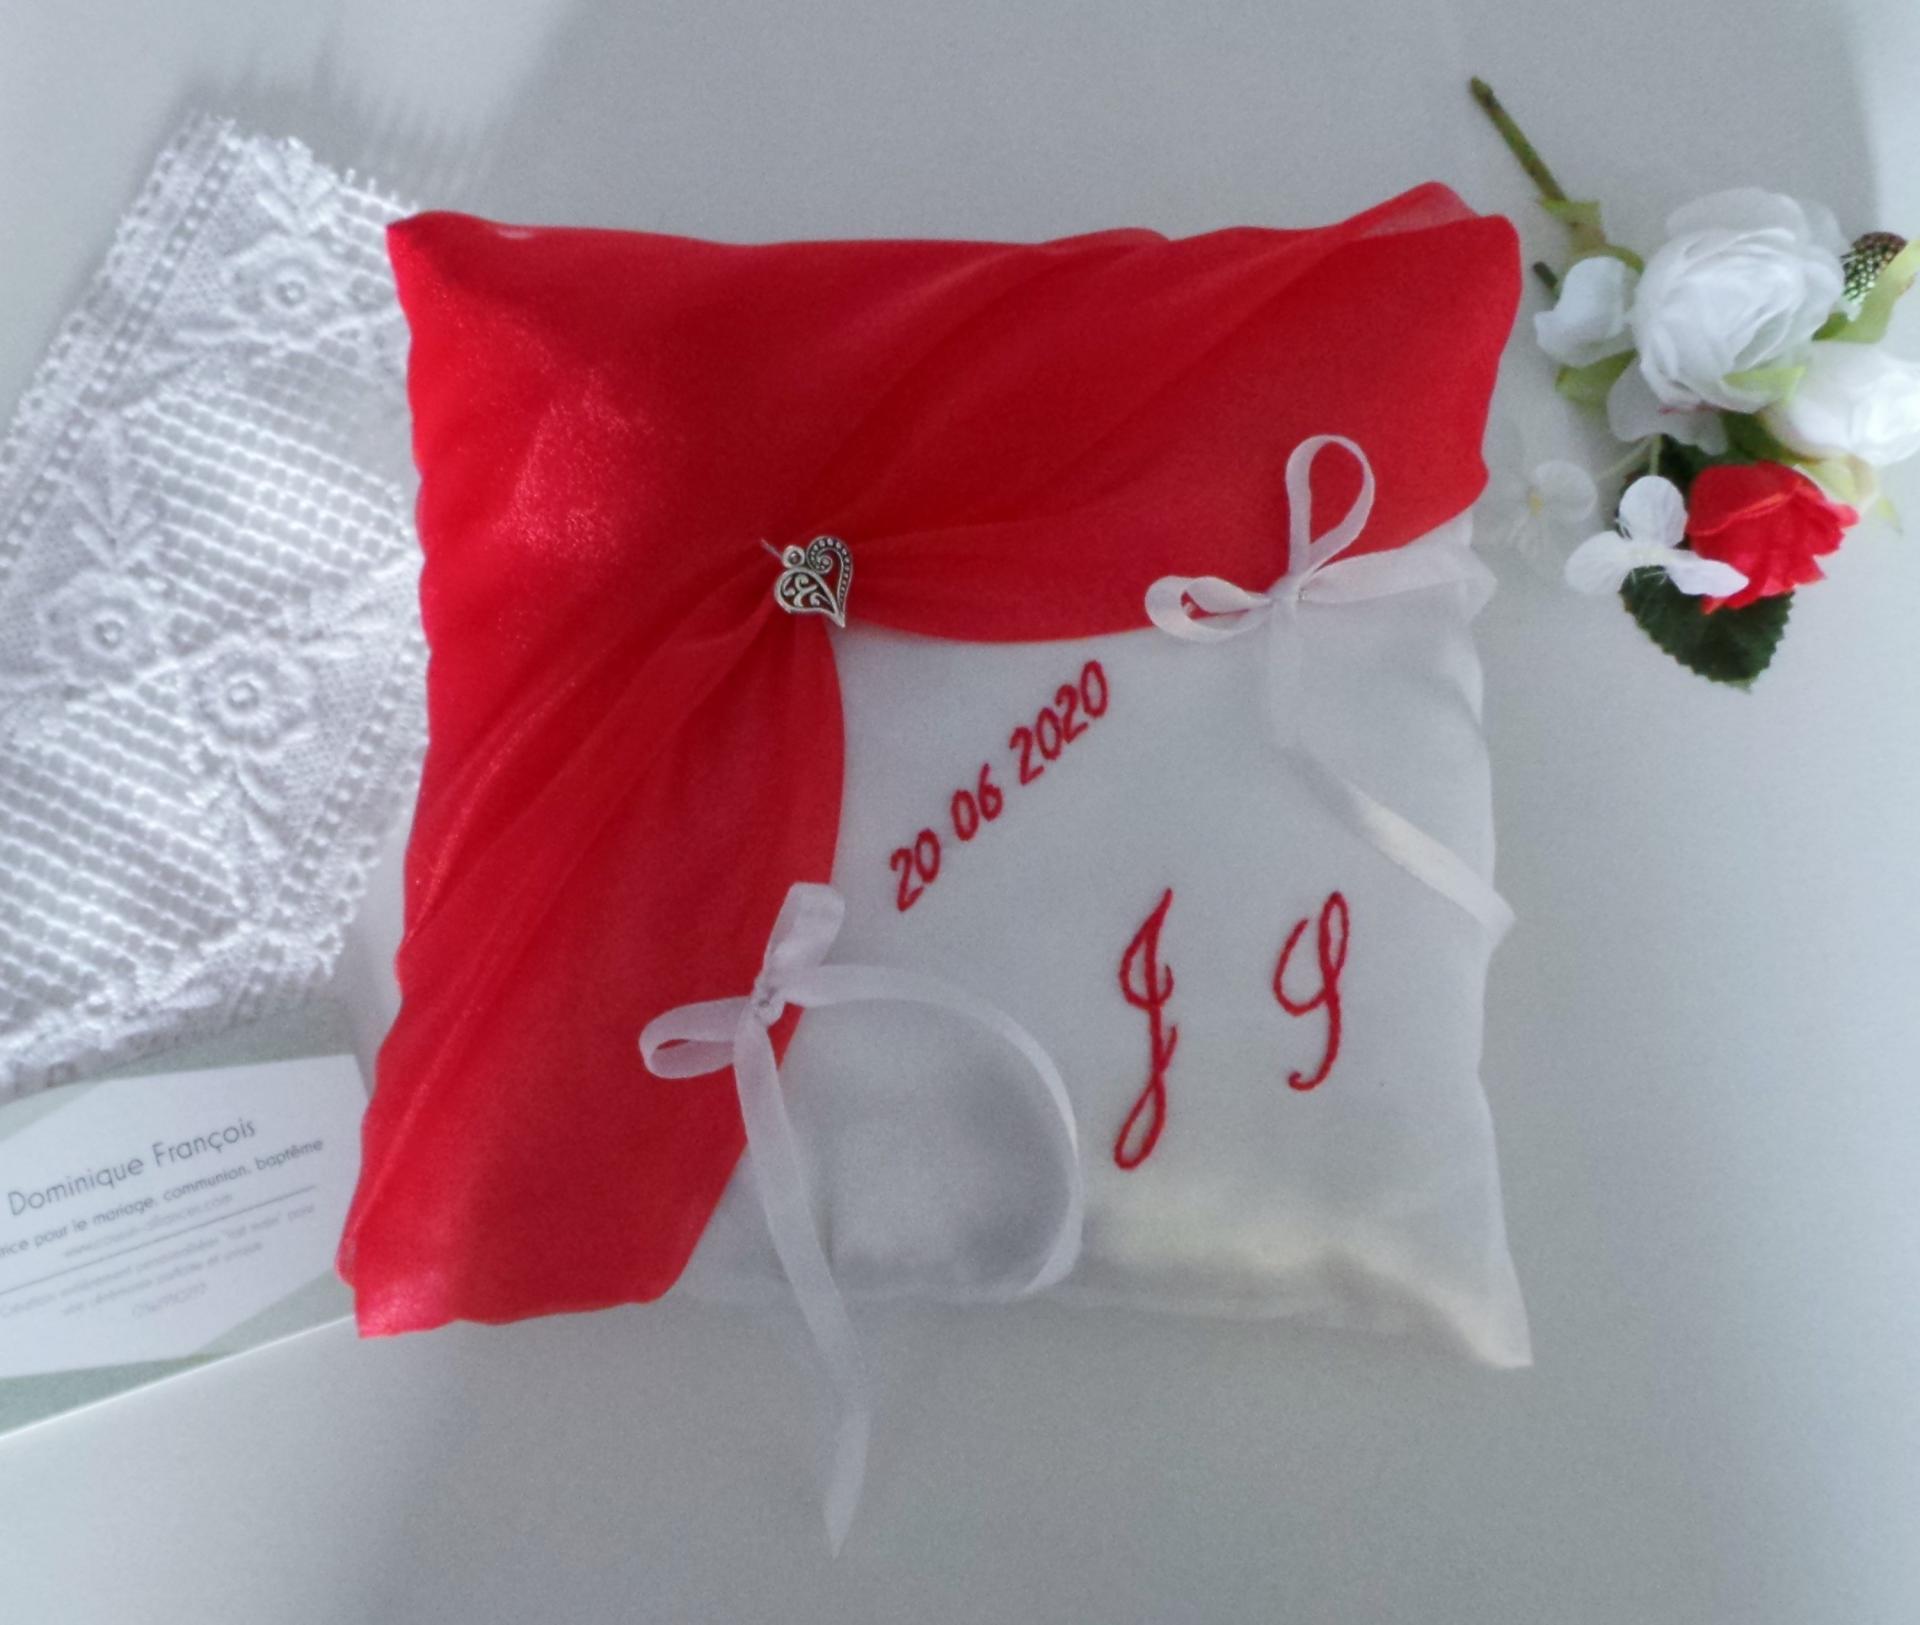 Mariage rouge et blanc coussin alliance personnalise